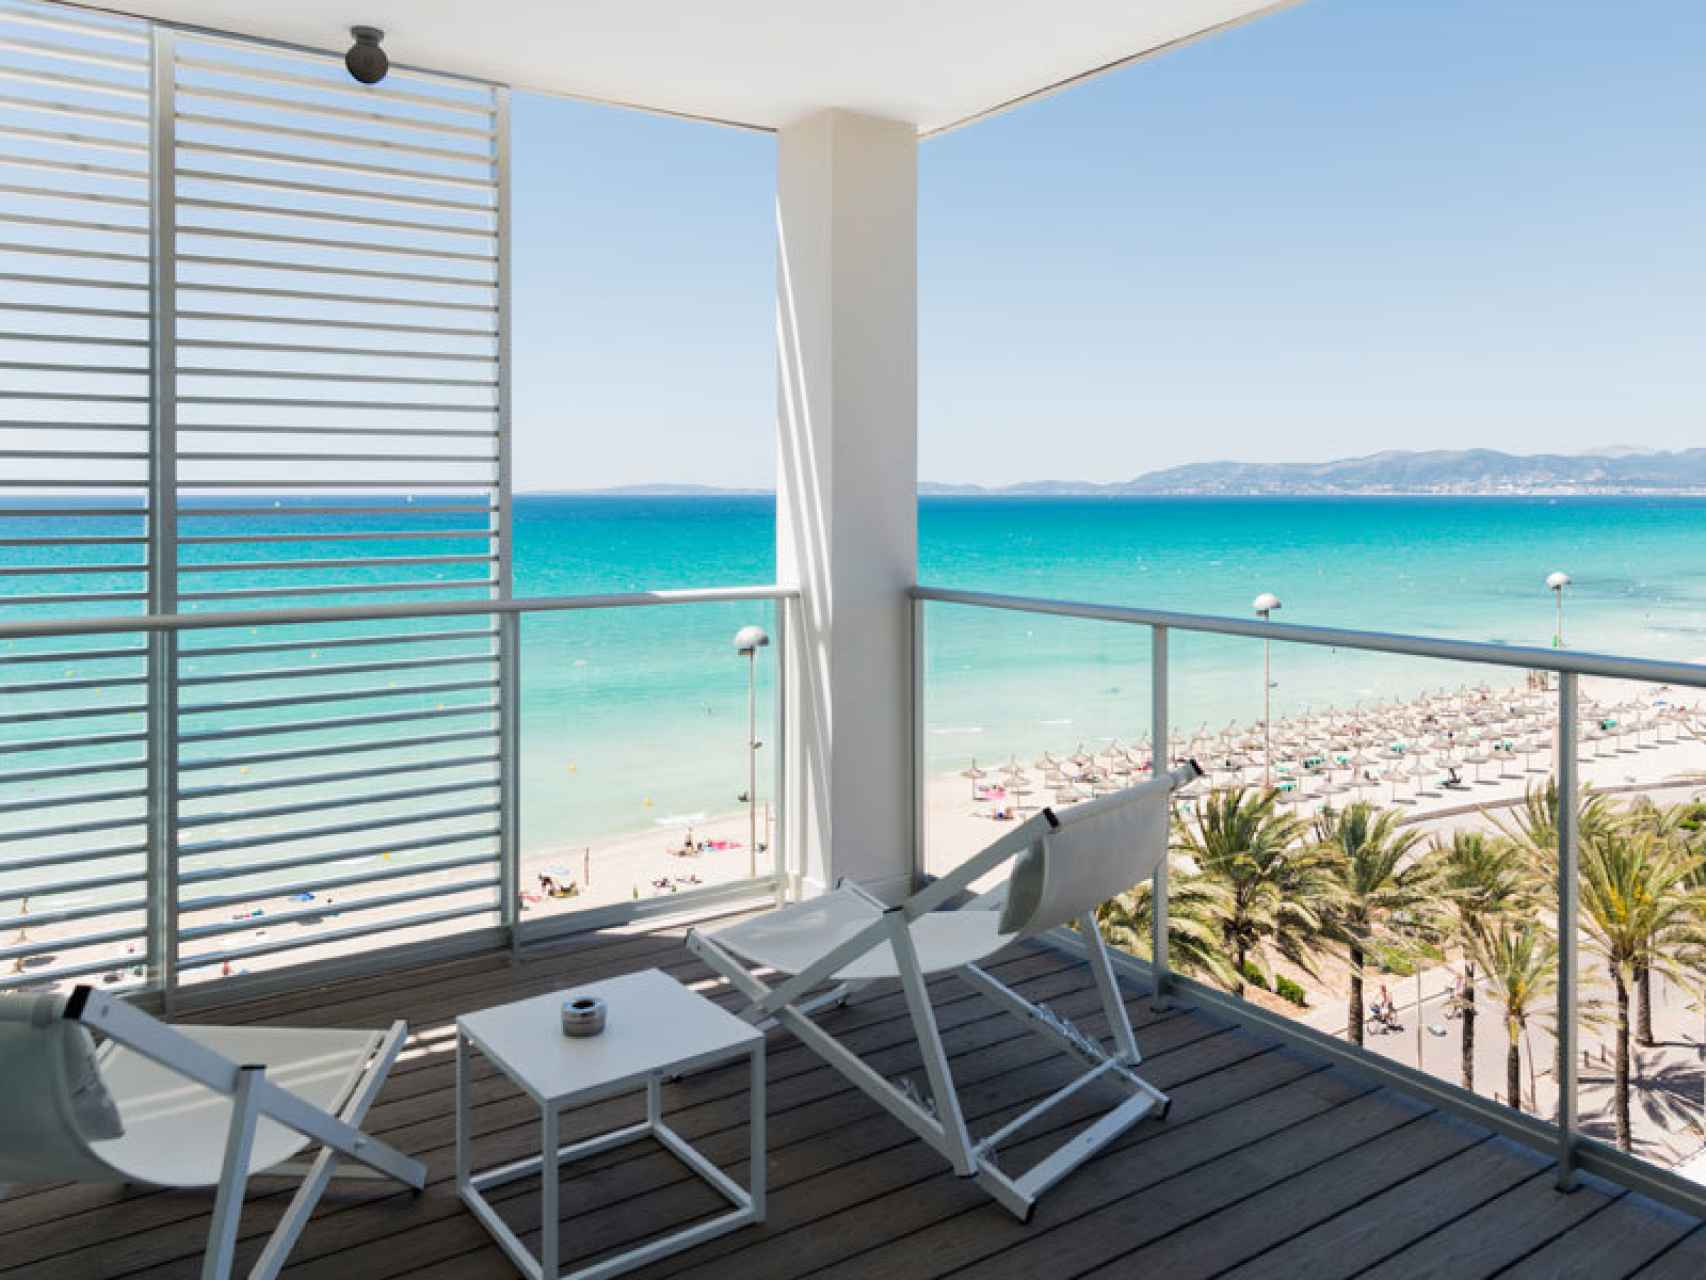 Terraza del hotel Garonda, en Mallorca.